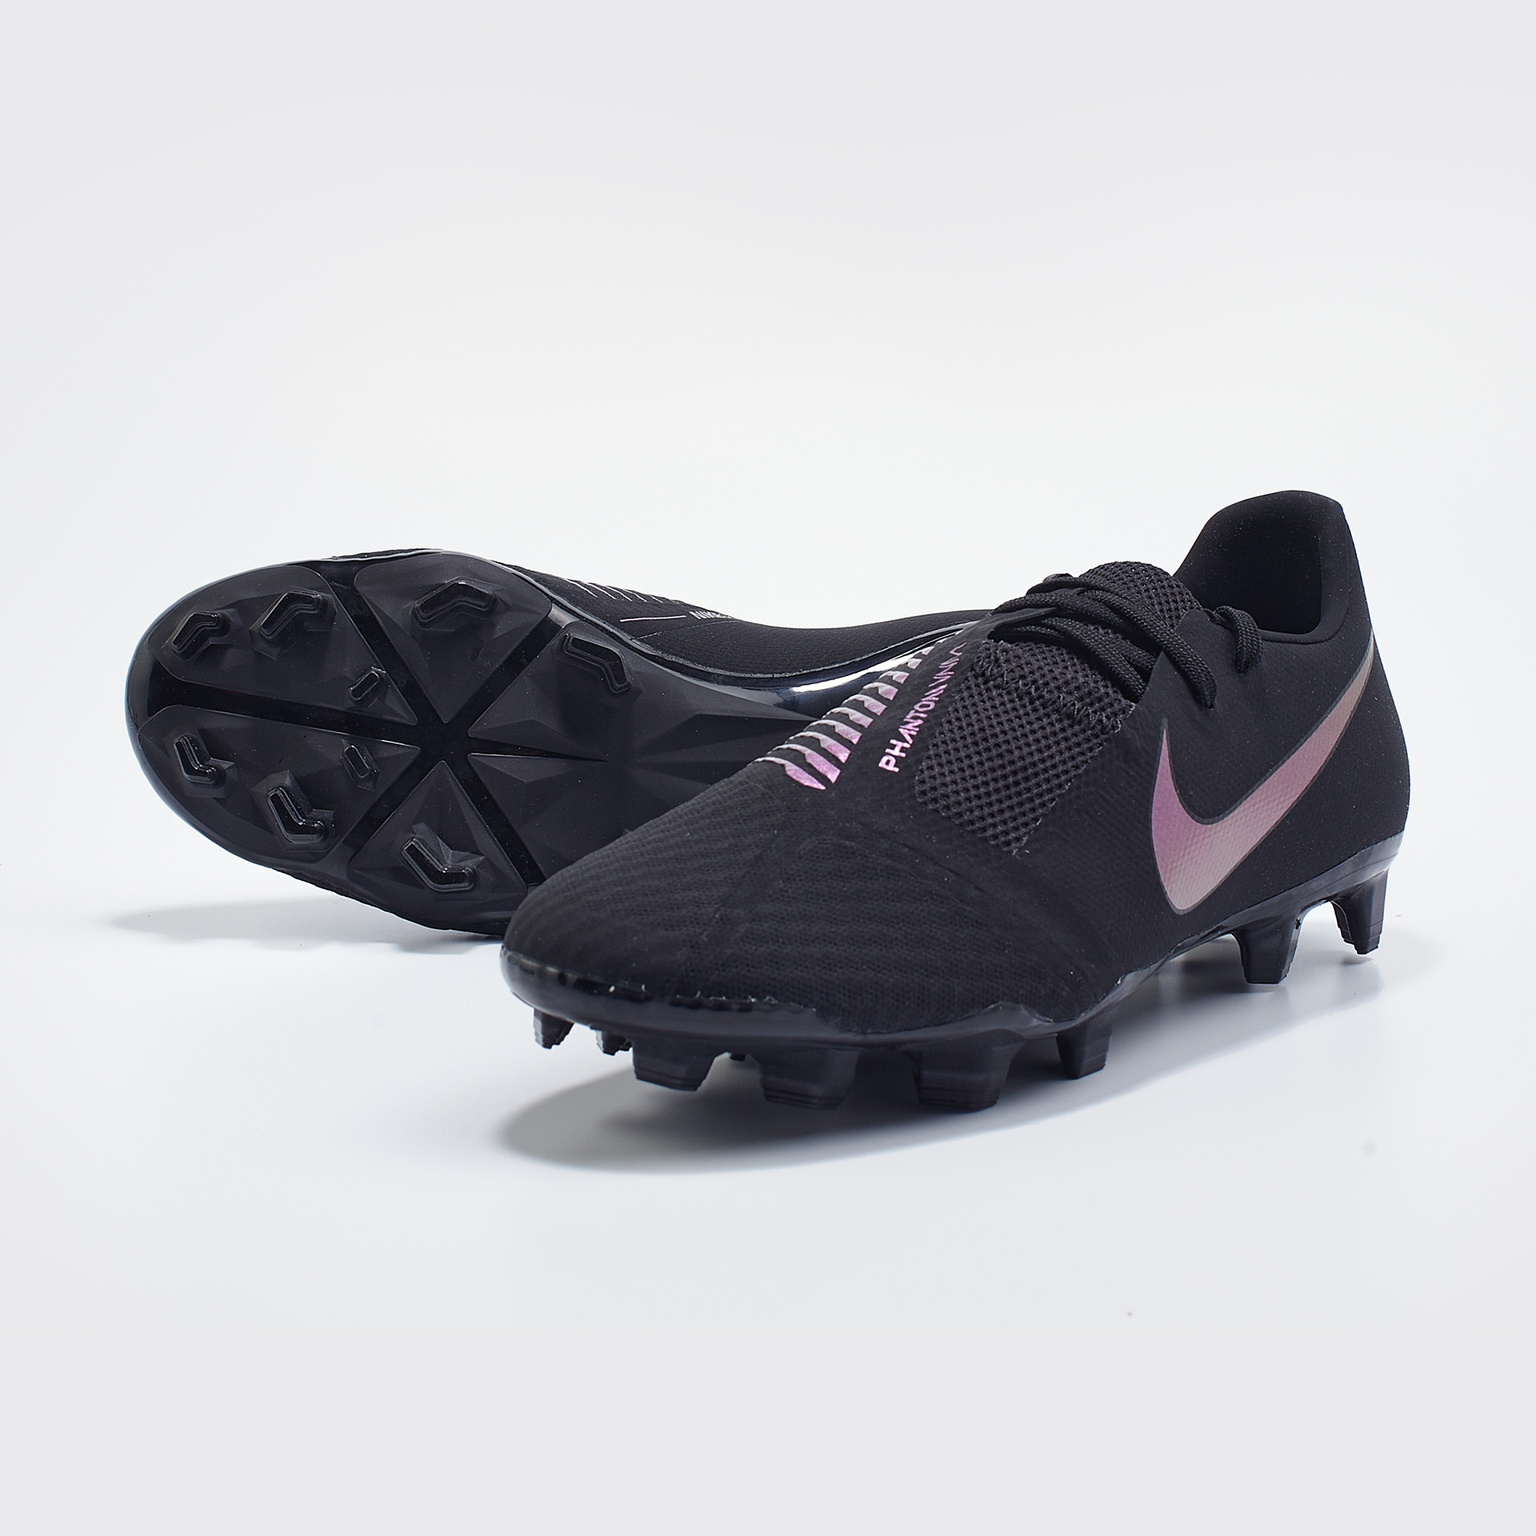 Бутсы Nike Phantom Venom Academy FG AO0566-010